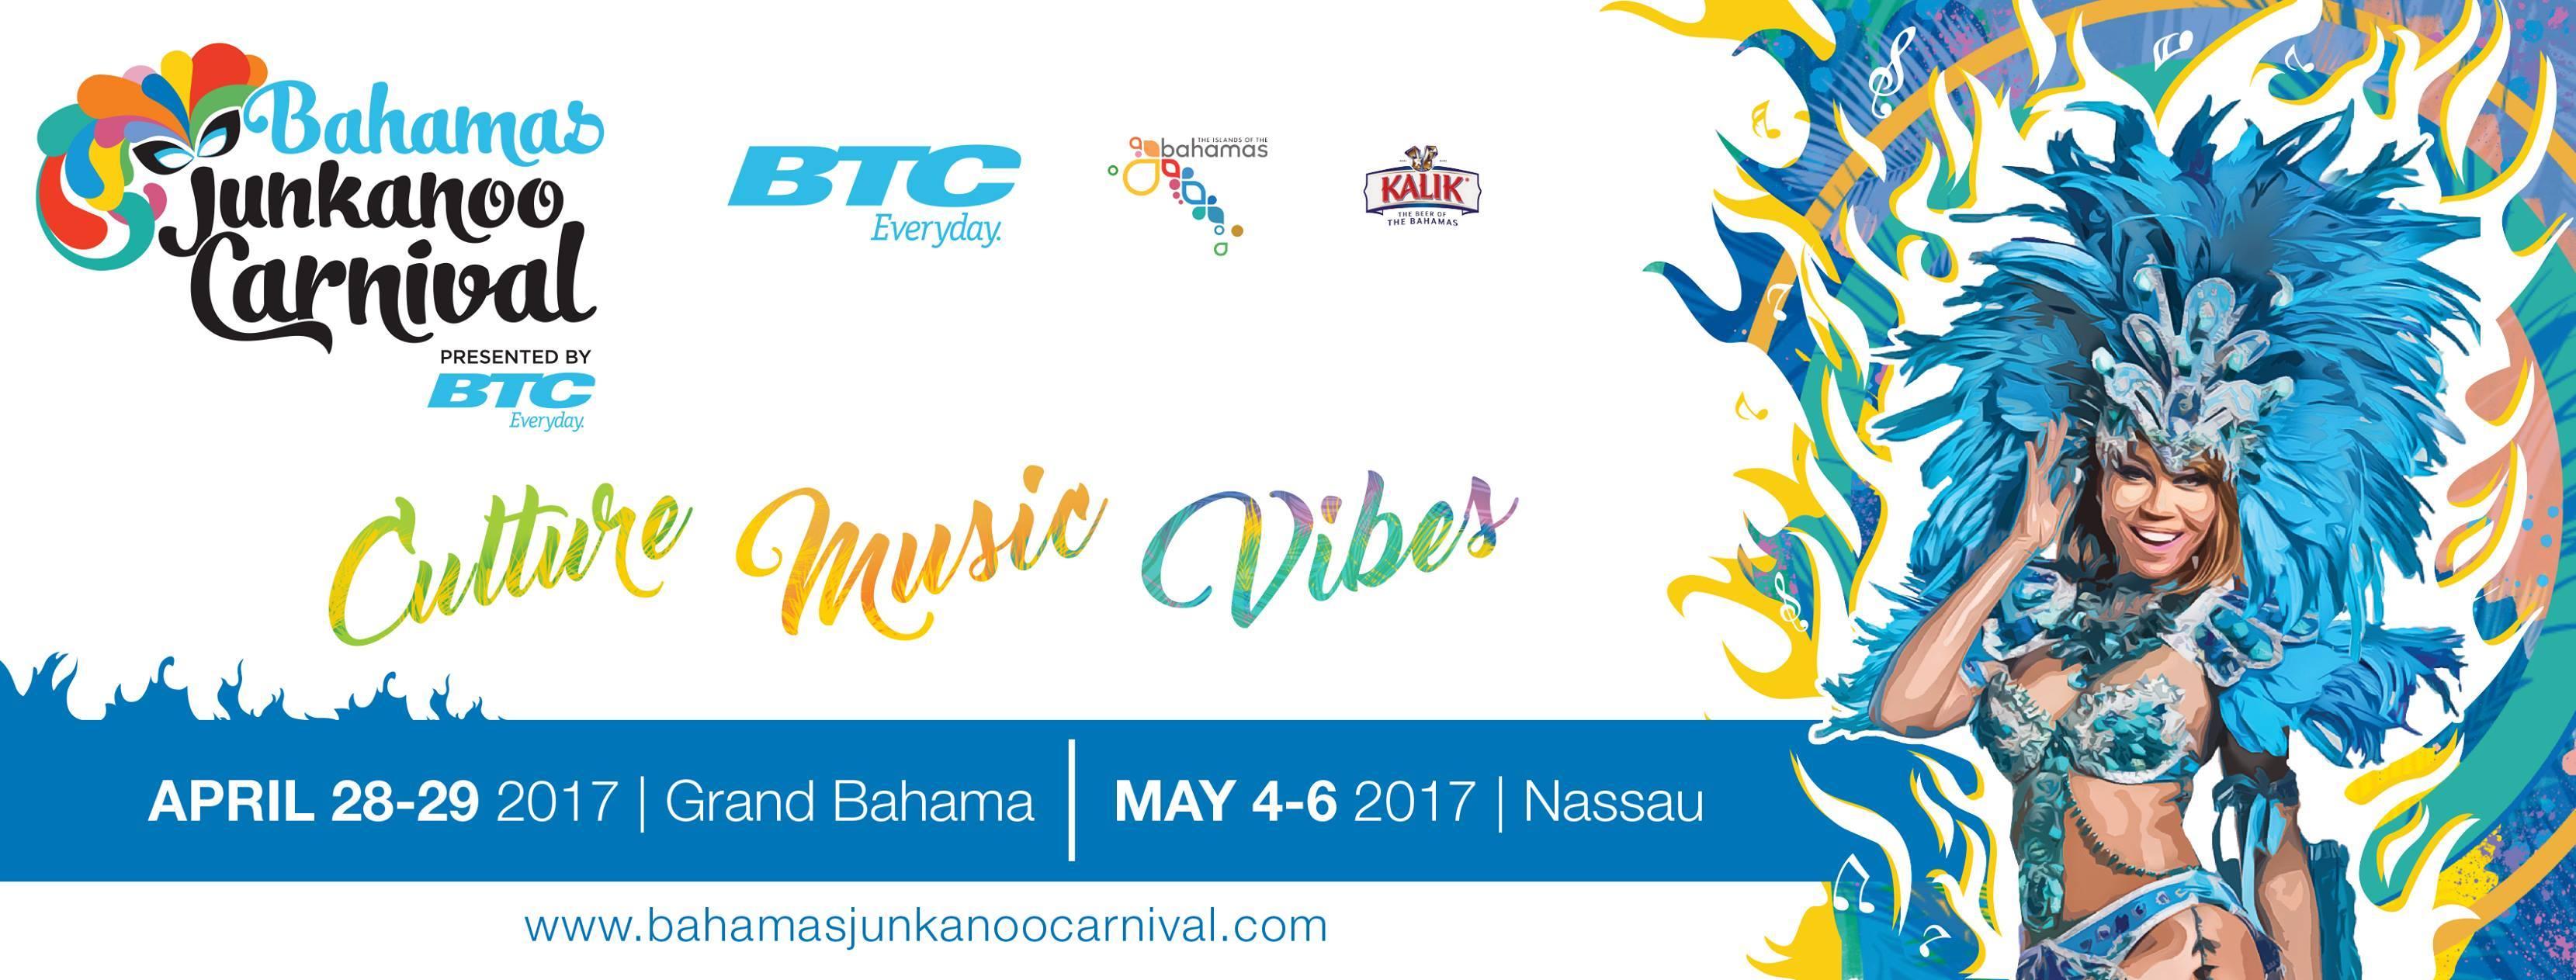 Bahamas Junkanoo Carnival 2017